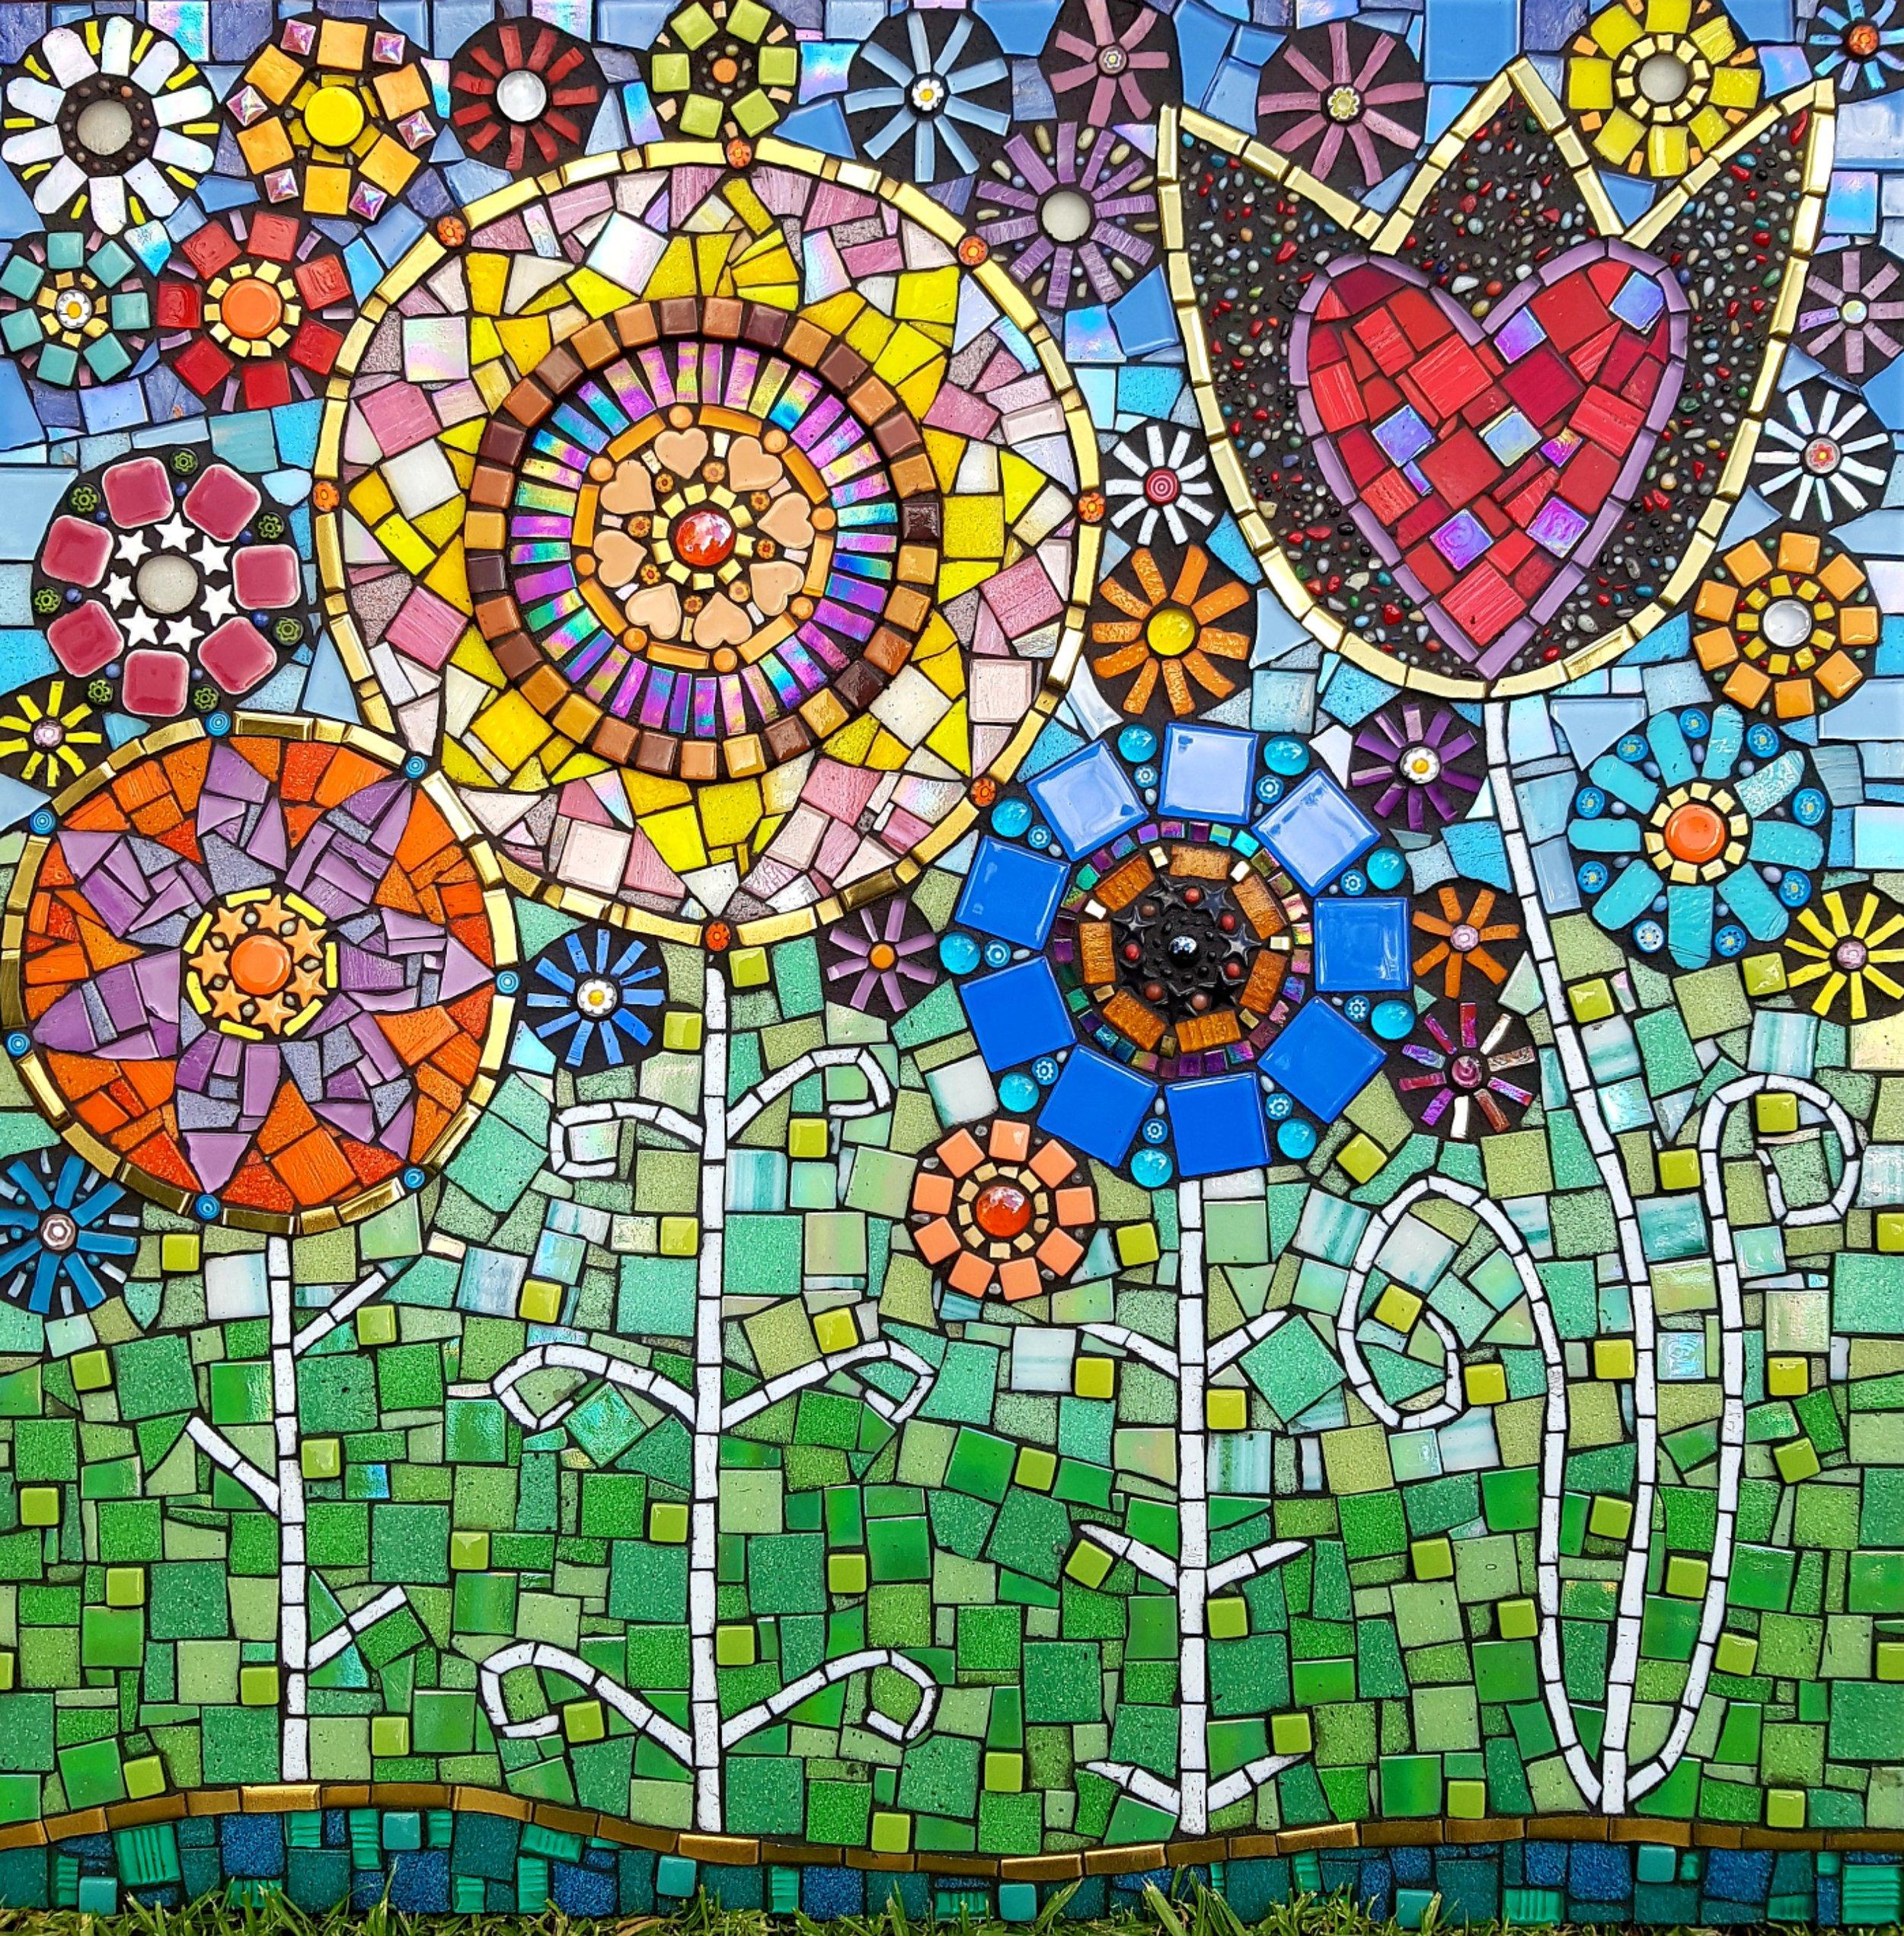 joanna alferink_2018_spring garden_mixed media on tilebacker board_60x60cm.jpg